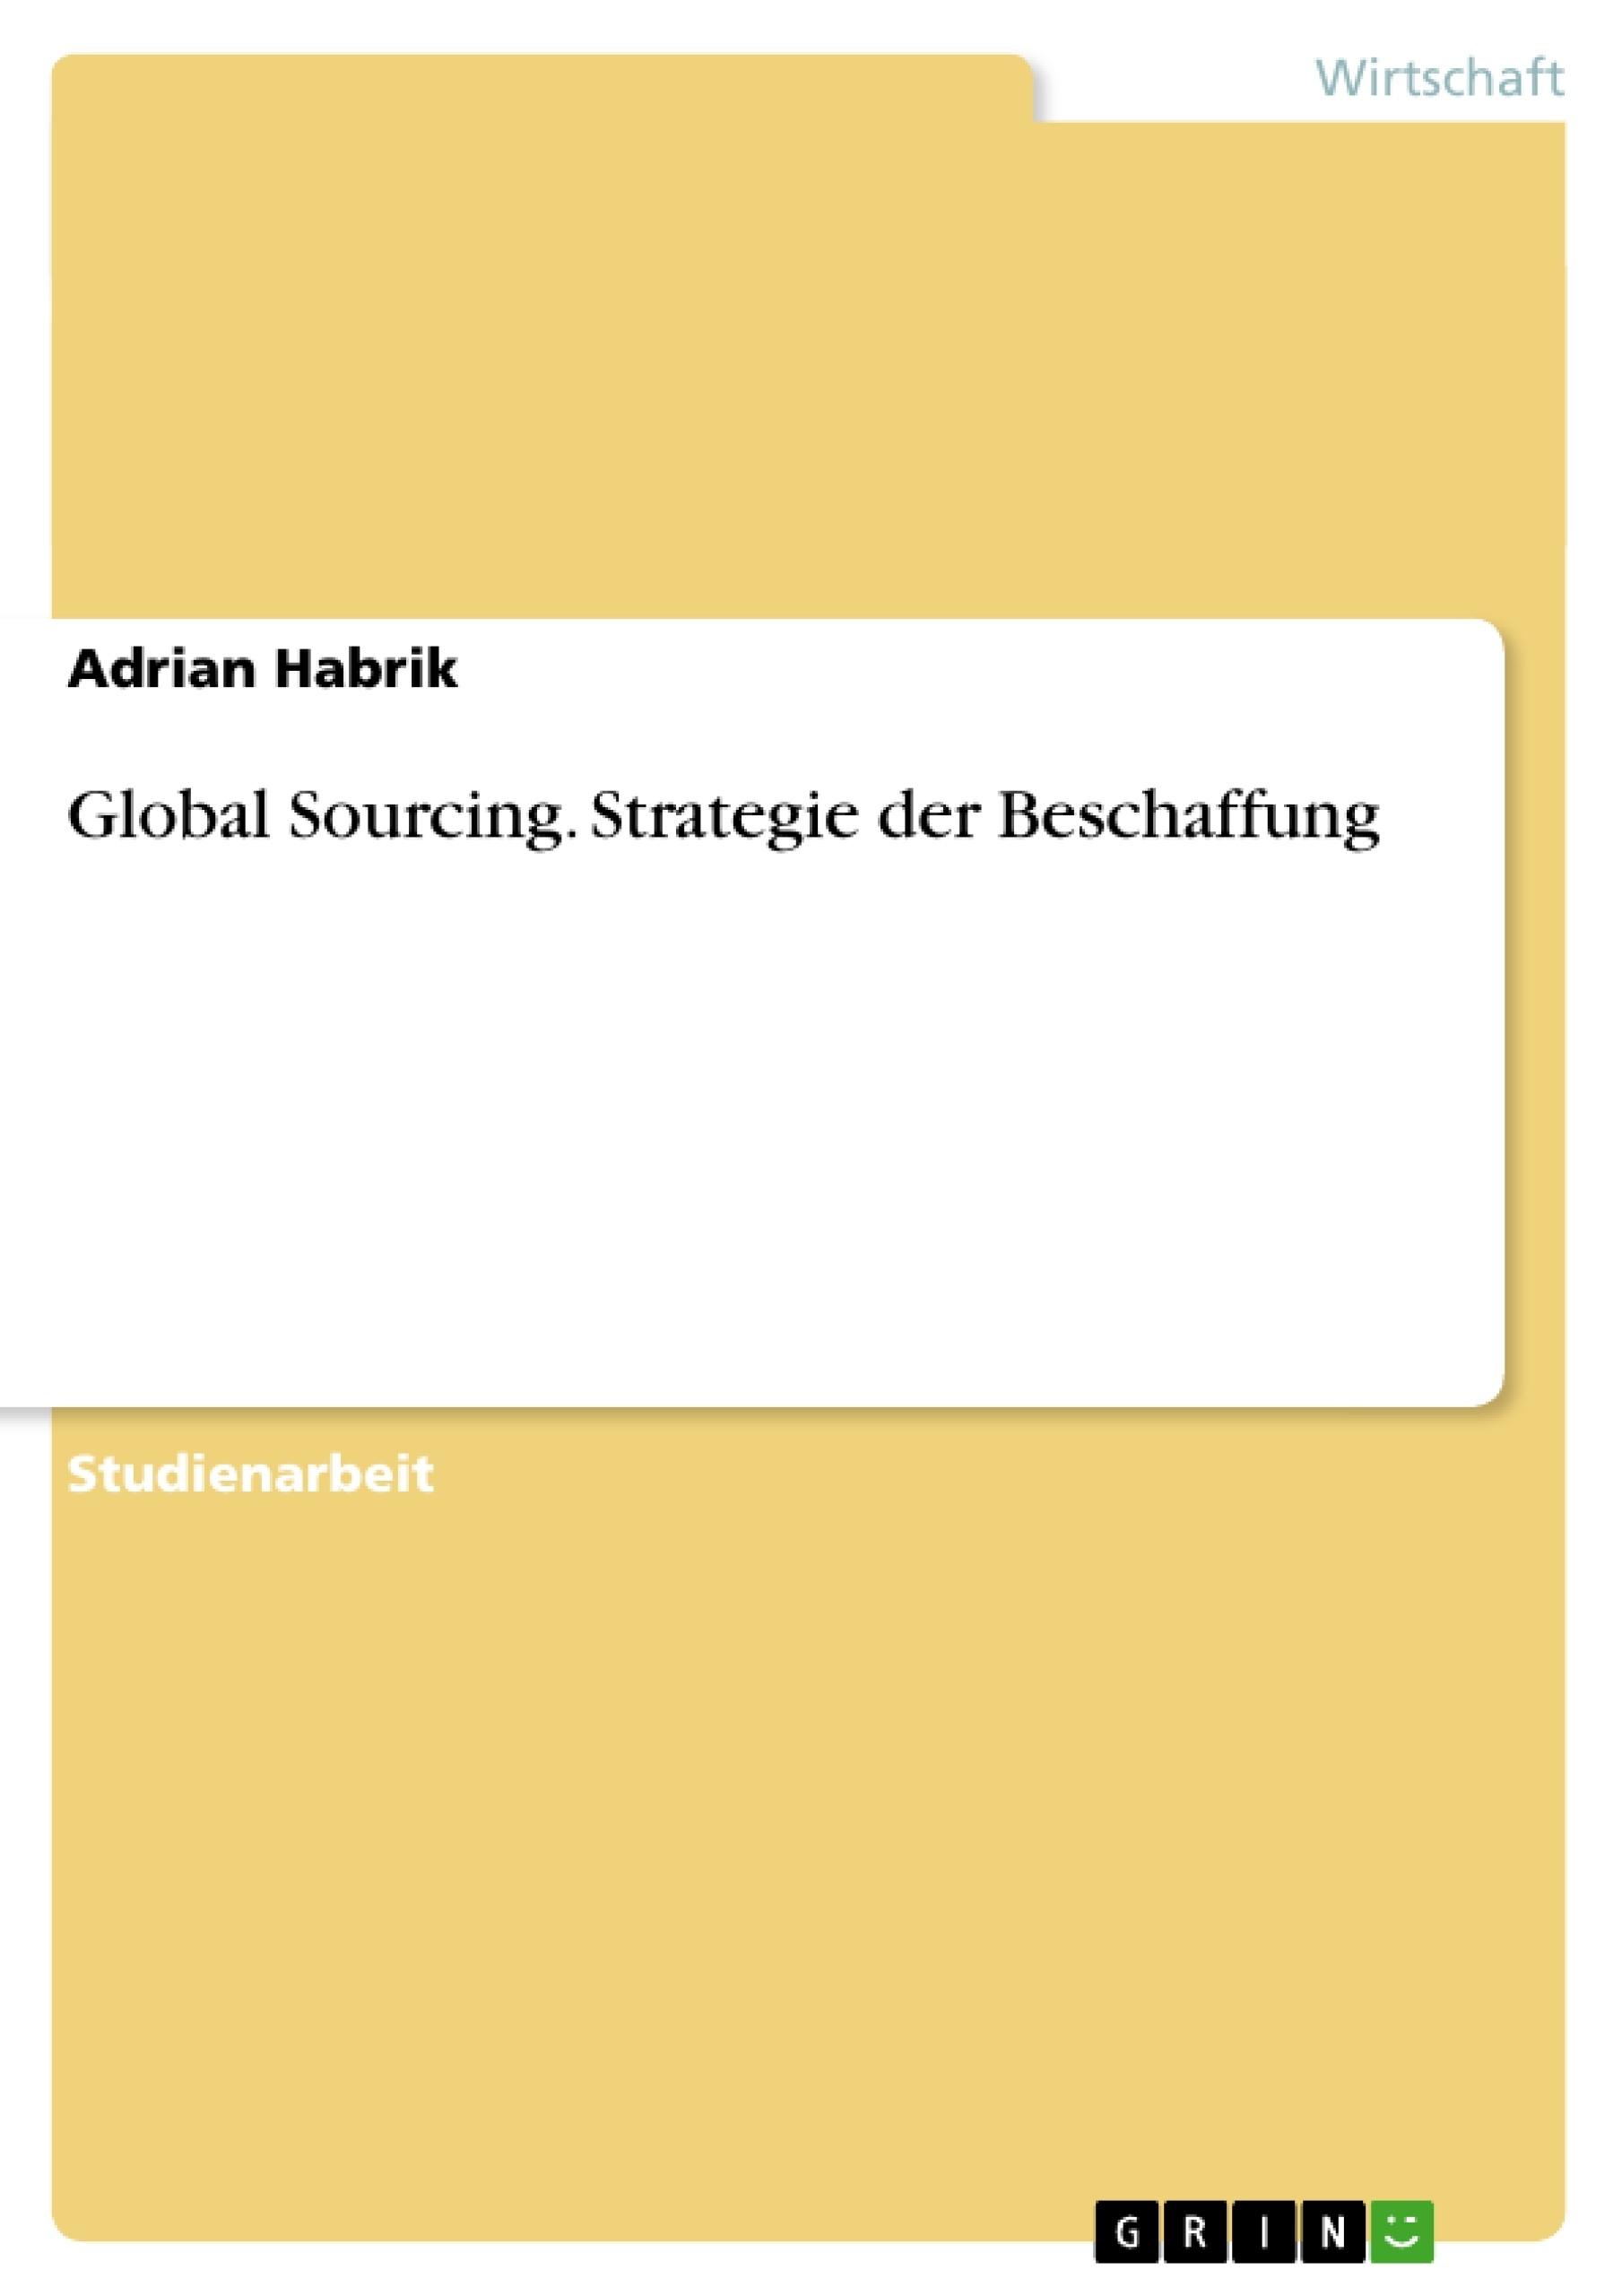 Titel: Global Sourcing. Strategie der Beschaffung